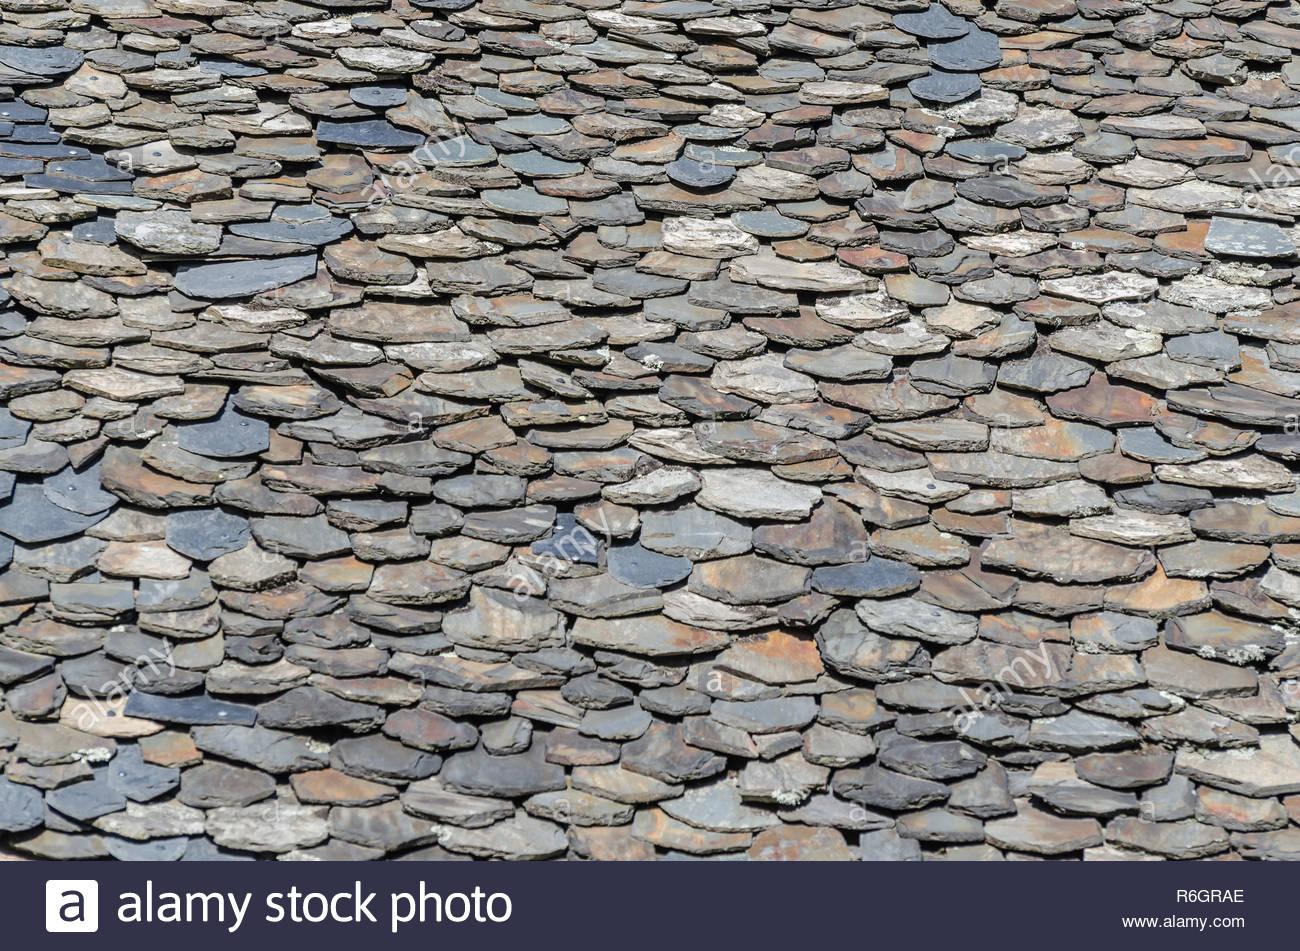 old shingle roof - Stock Image